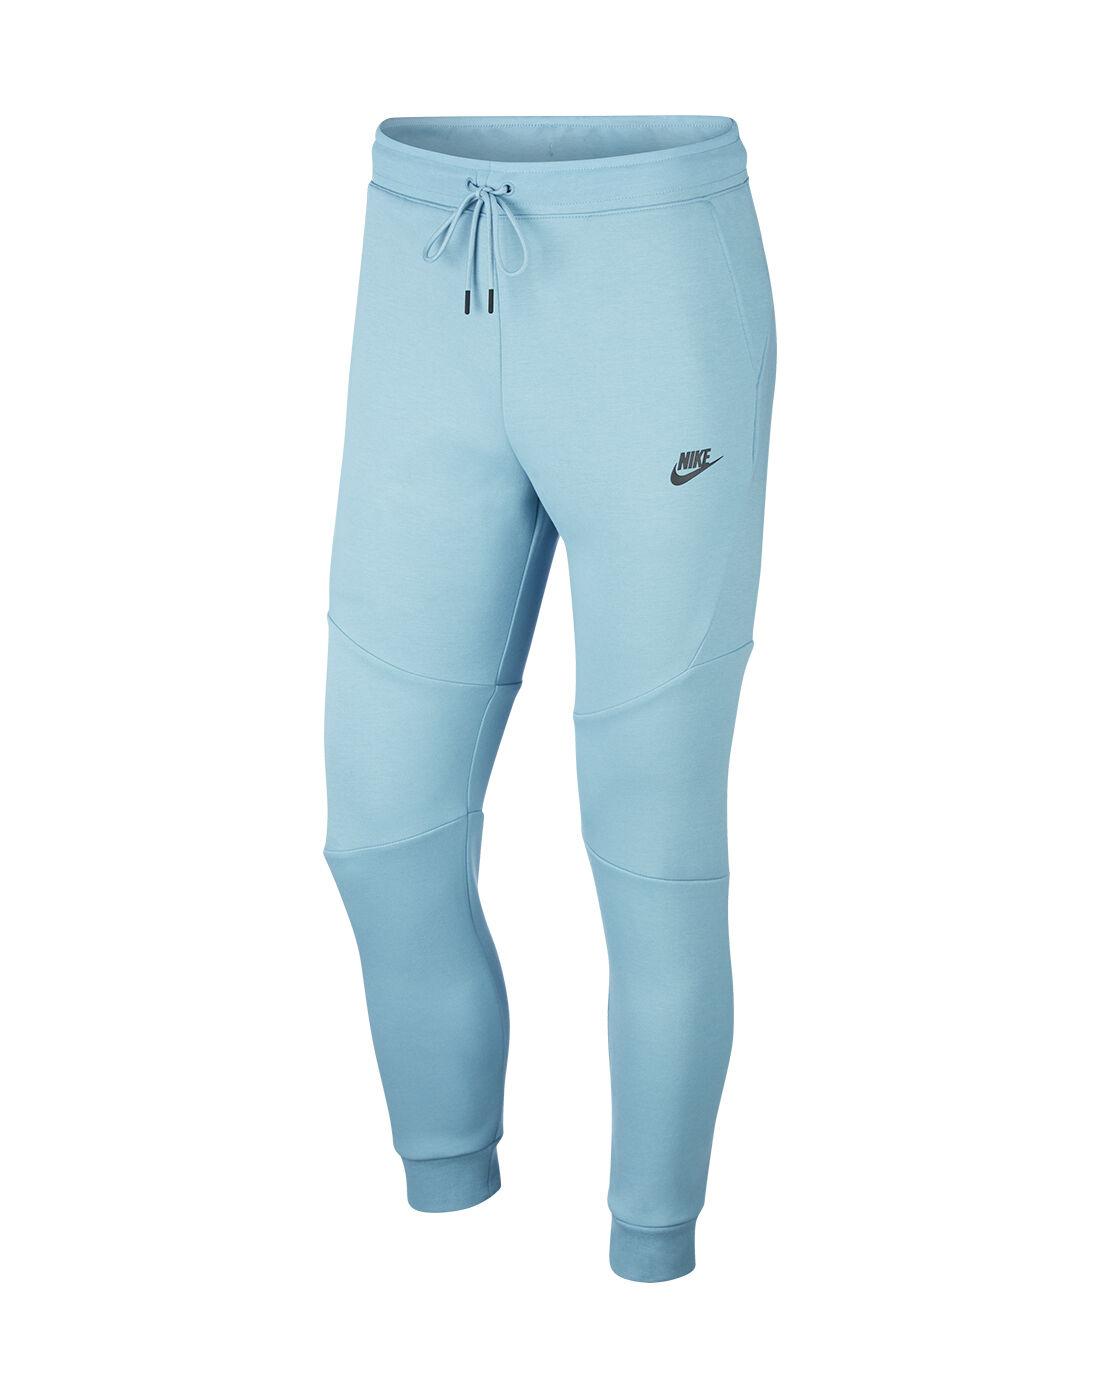 Nike Mens Tech Fleece Joggers - Blue   Life Style Sports EU